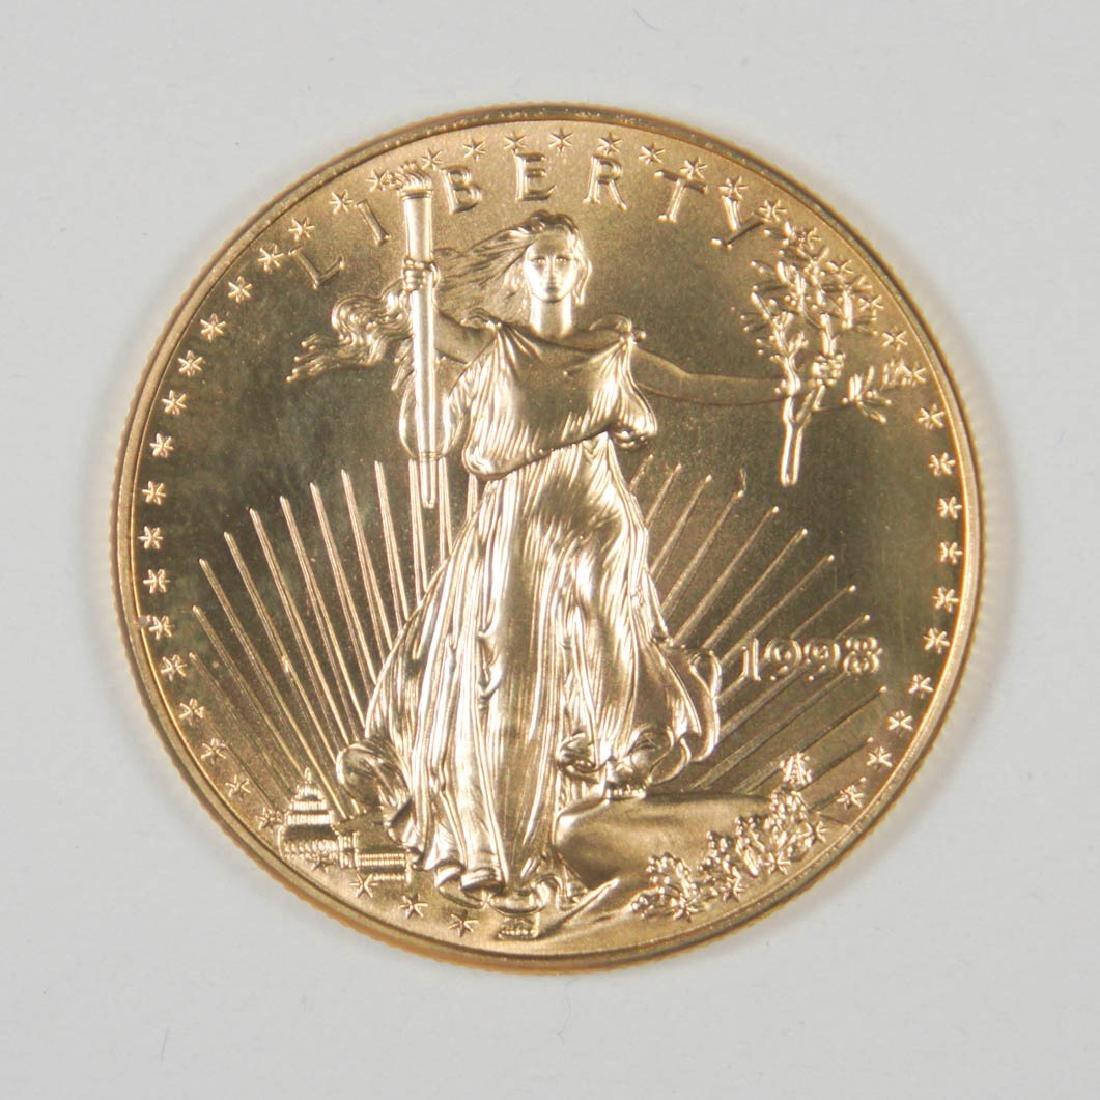 1998 Gold American Eagle $50 U.S. 1 Ounce .999